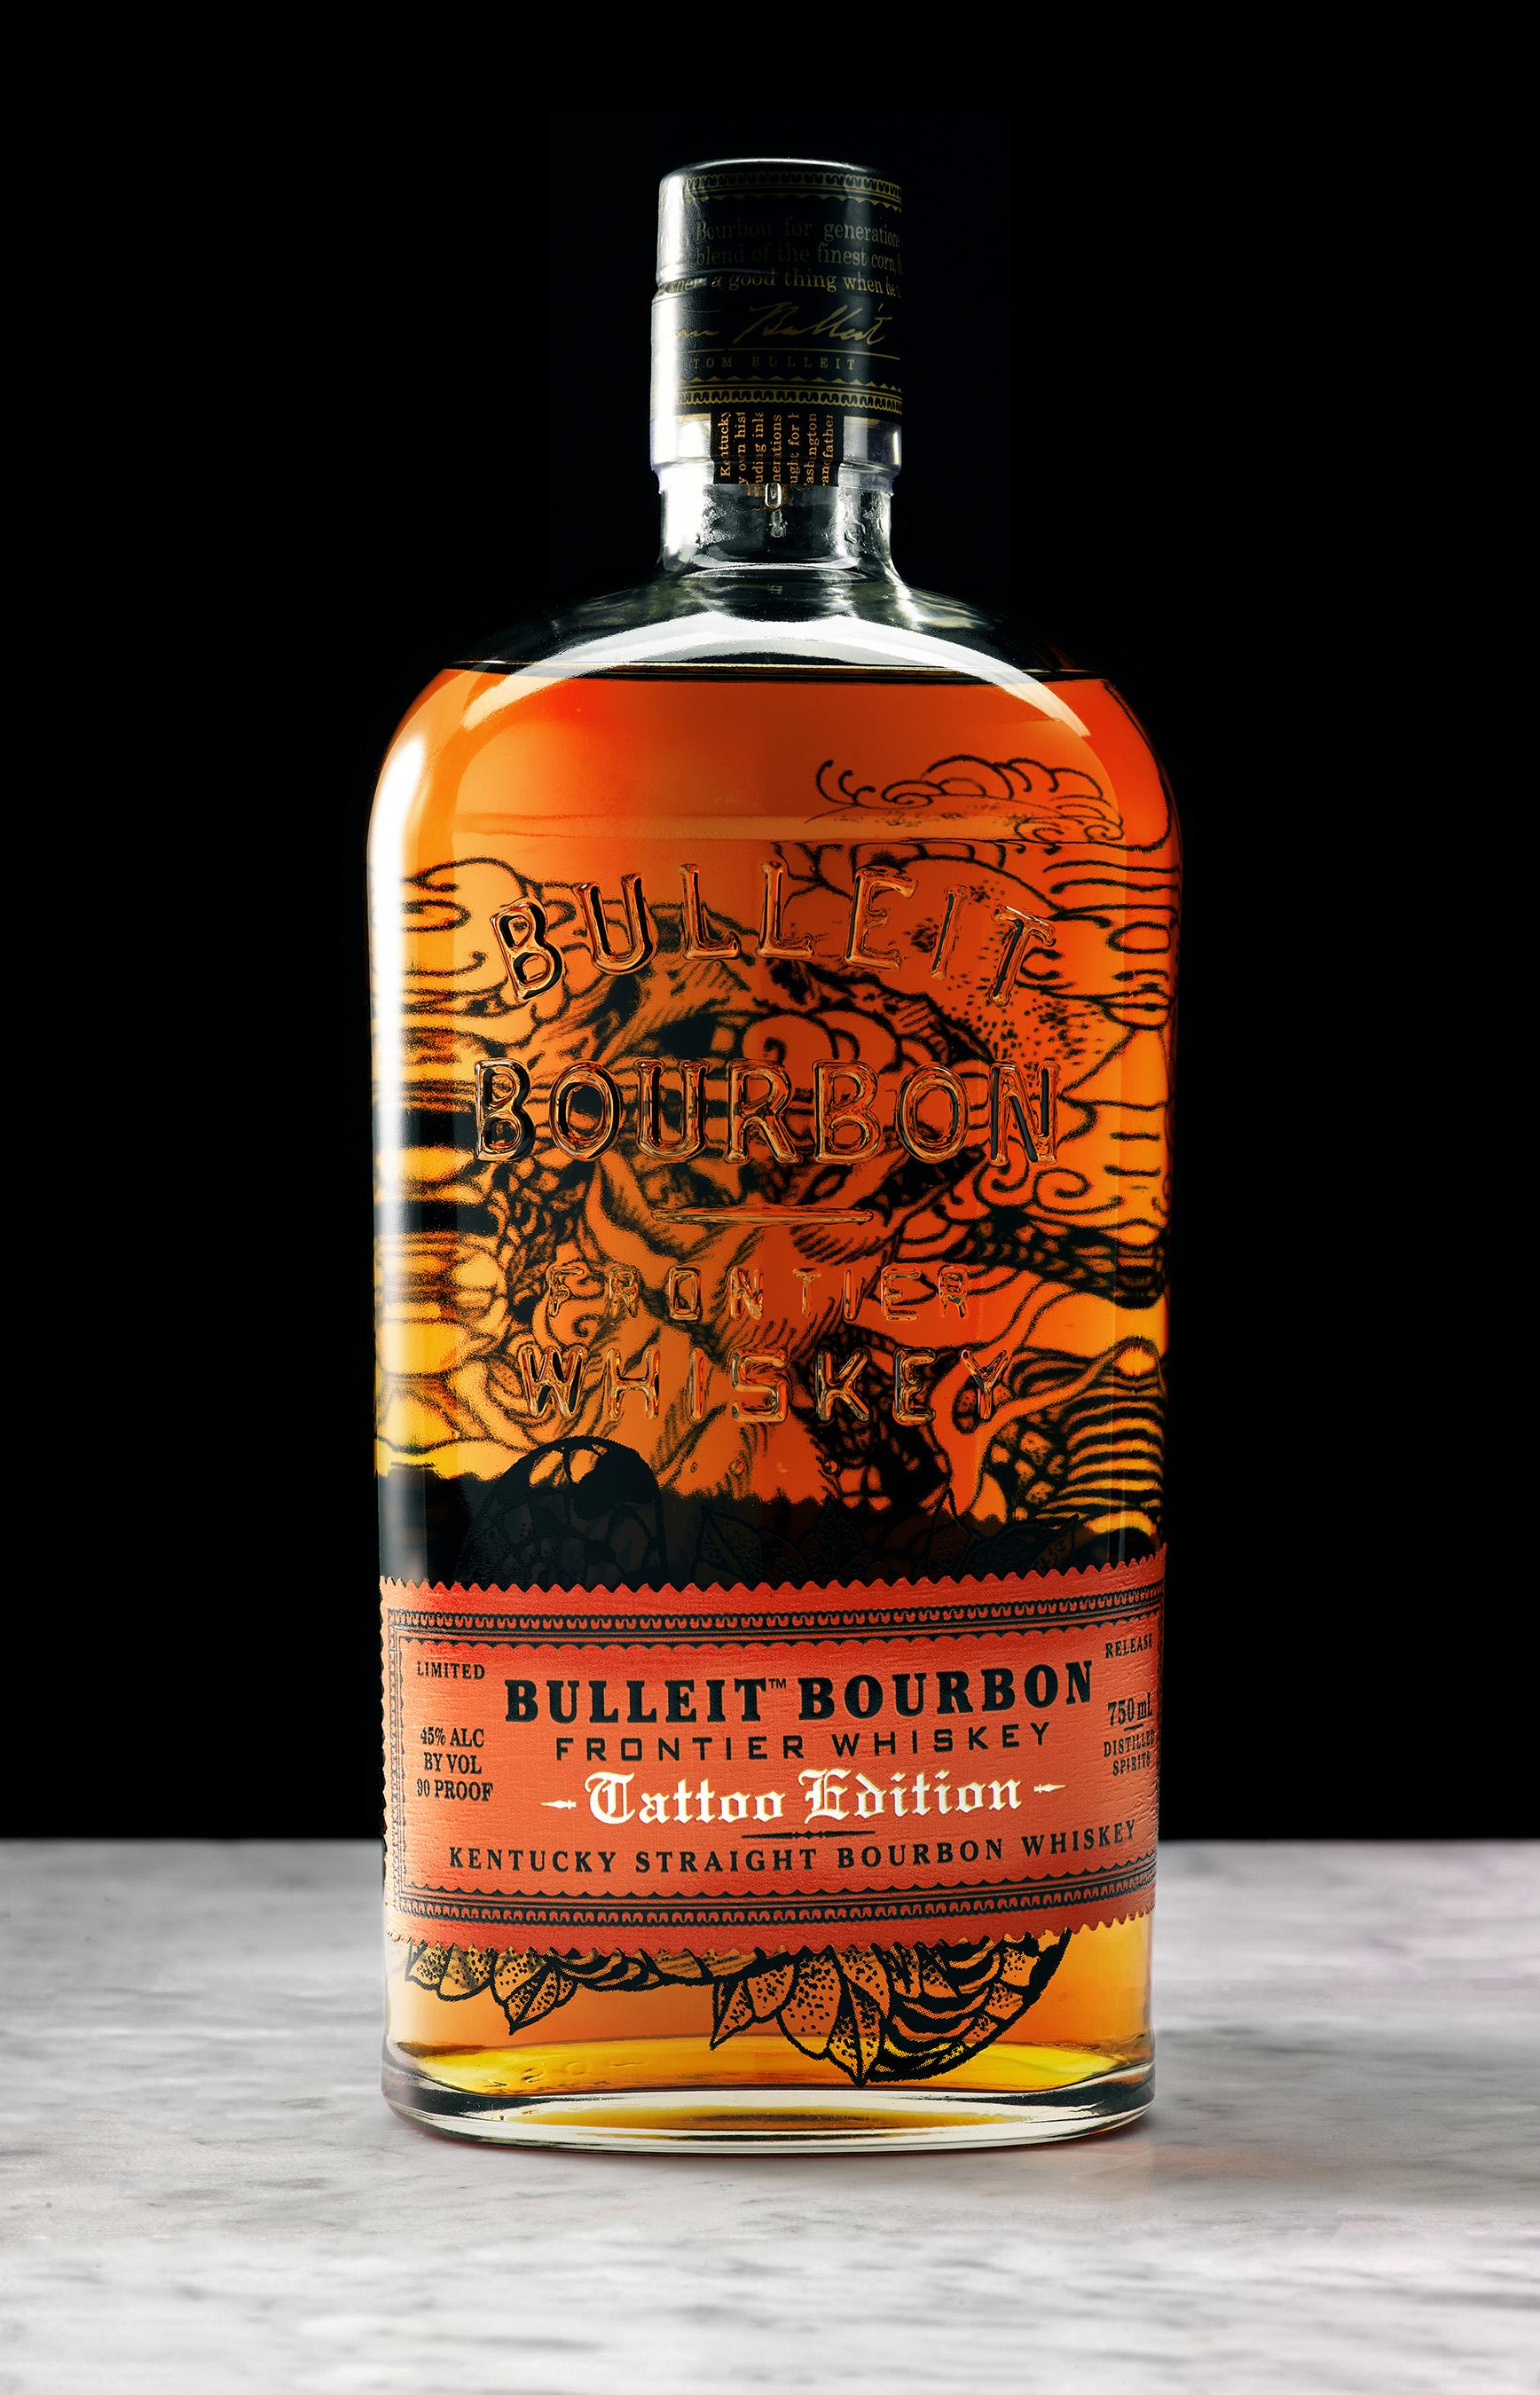 Bulleit Bourbon Tattoo Edition bottle designed by Portland tattoo artist Jason Kundell